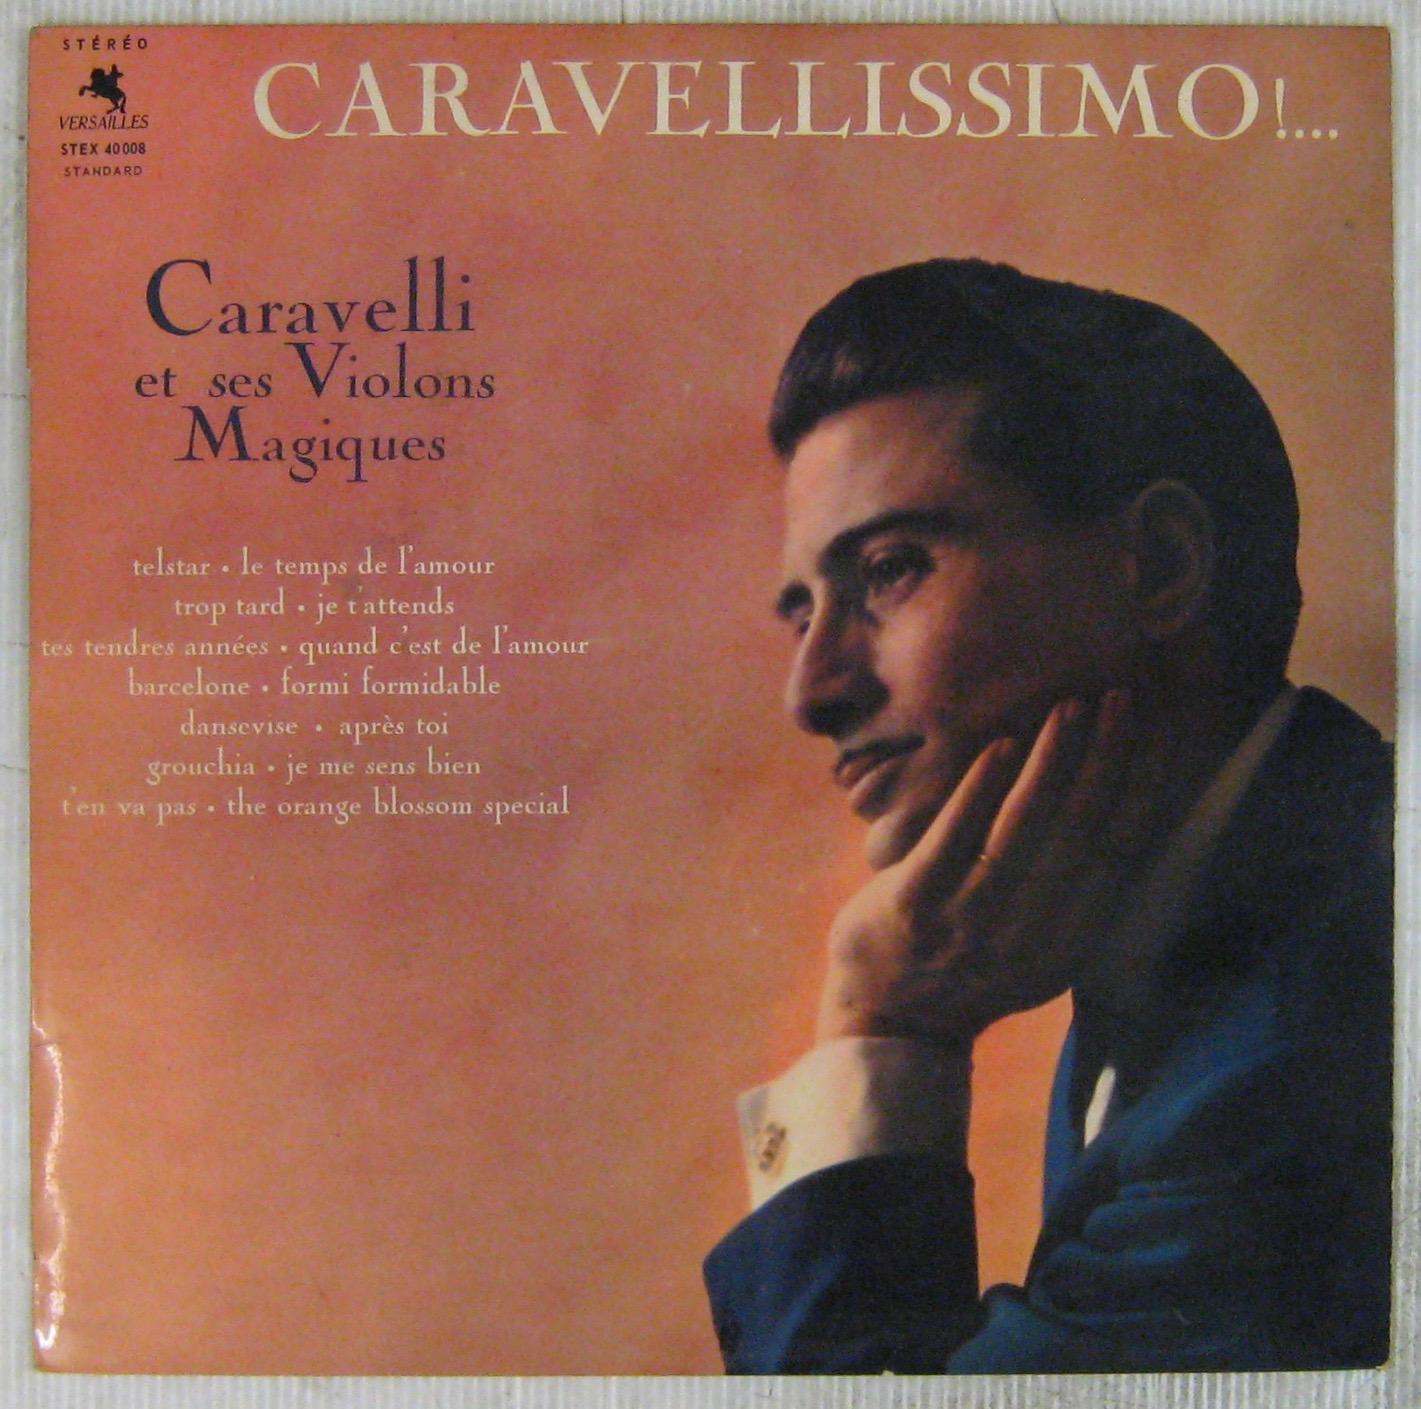 CARAVELLI - Caravellissimo !... - 33T